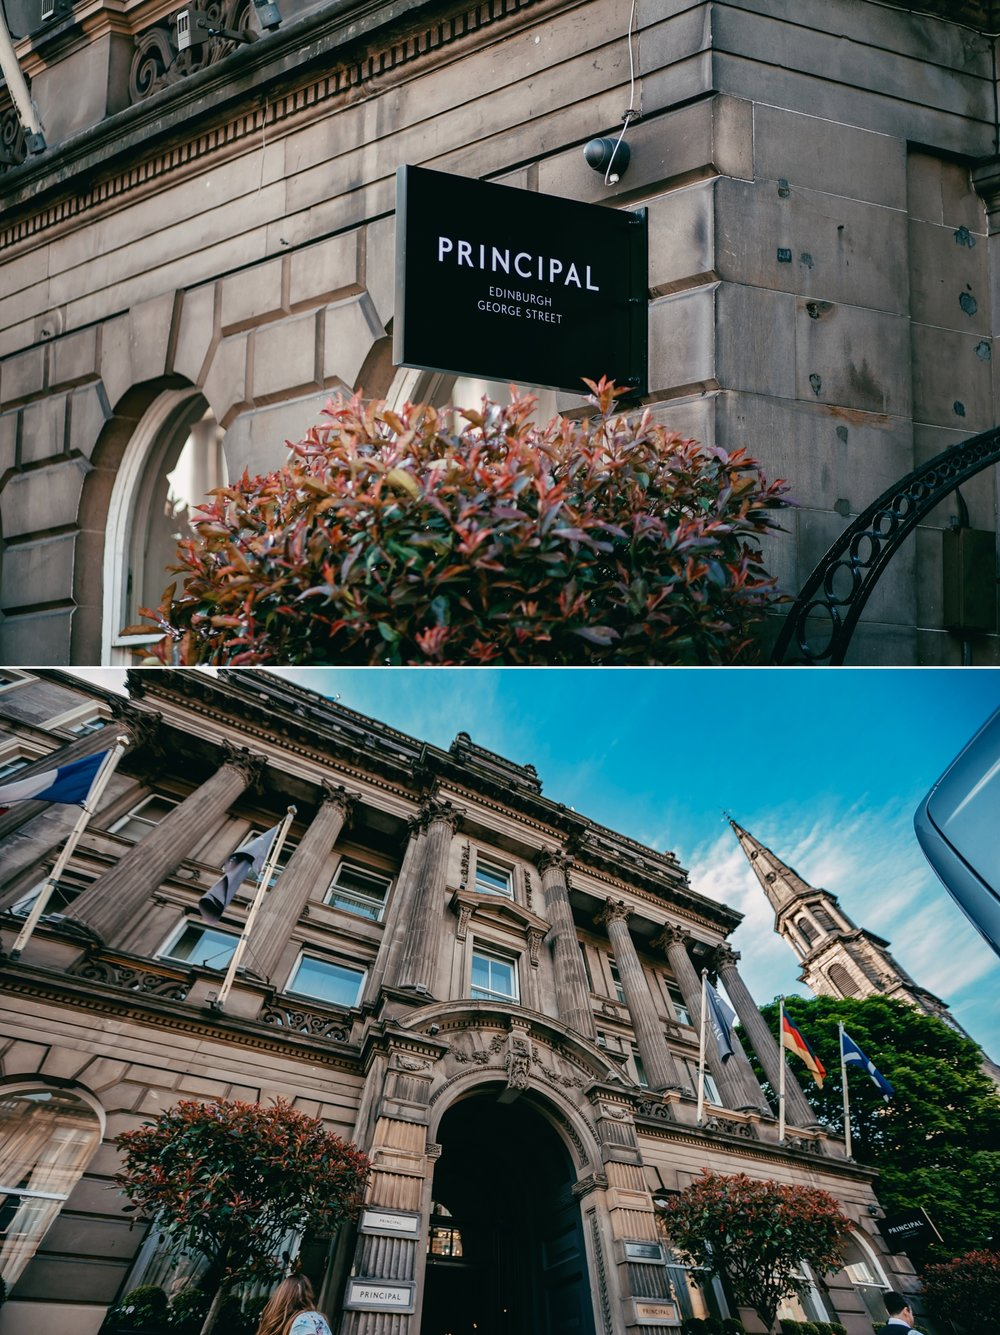 008-Carla-Dexter-The-Principal-Hotel-George-St-Edinburgh.jpg